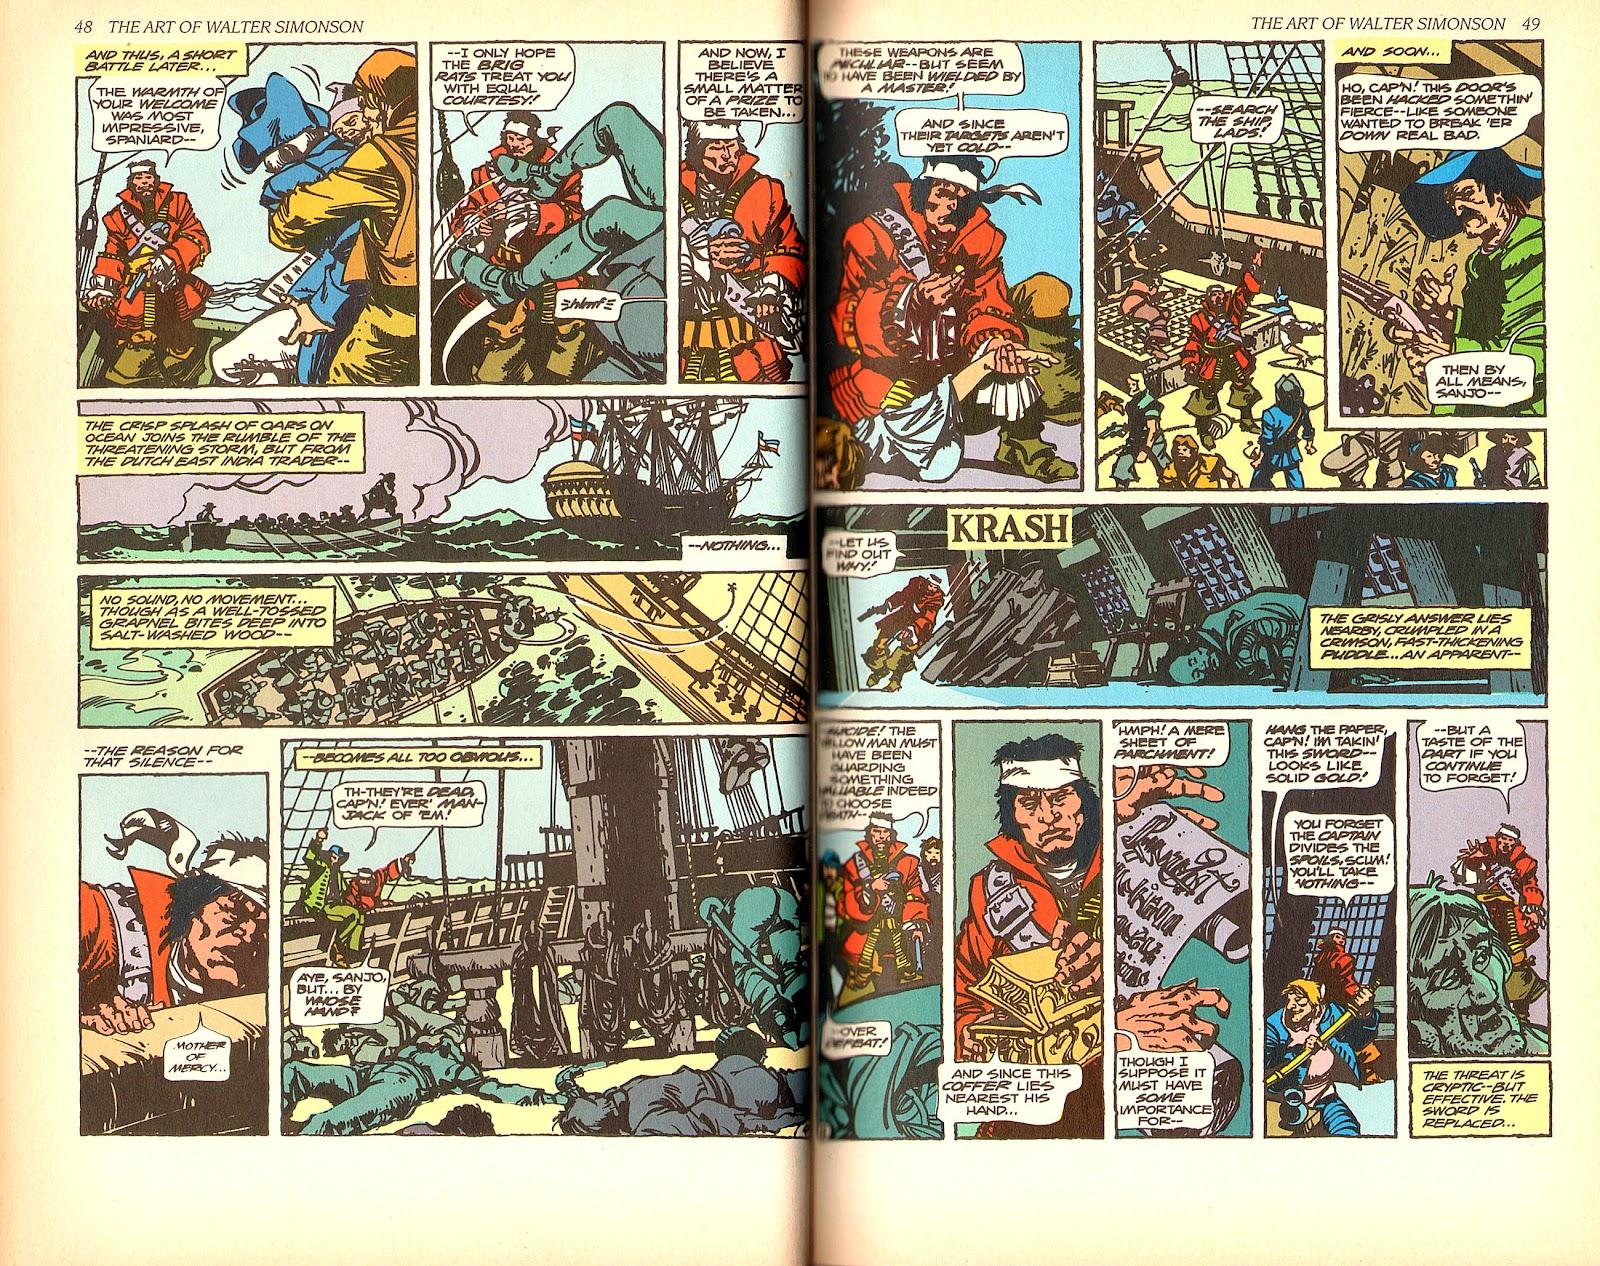 Read online The Art of Walter Simonson comic -  Issue # TPB - 26